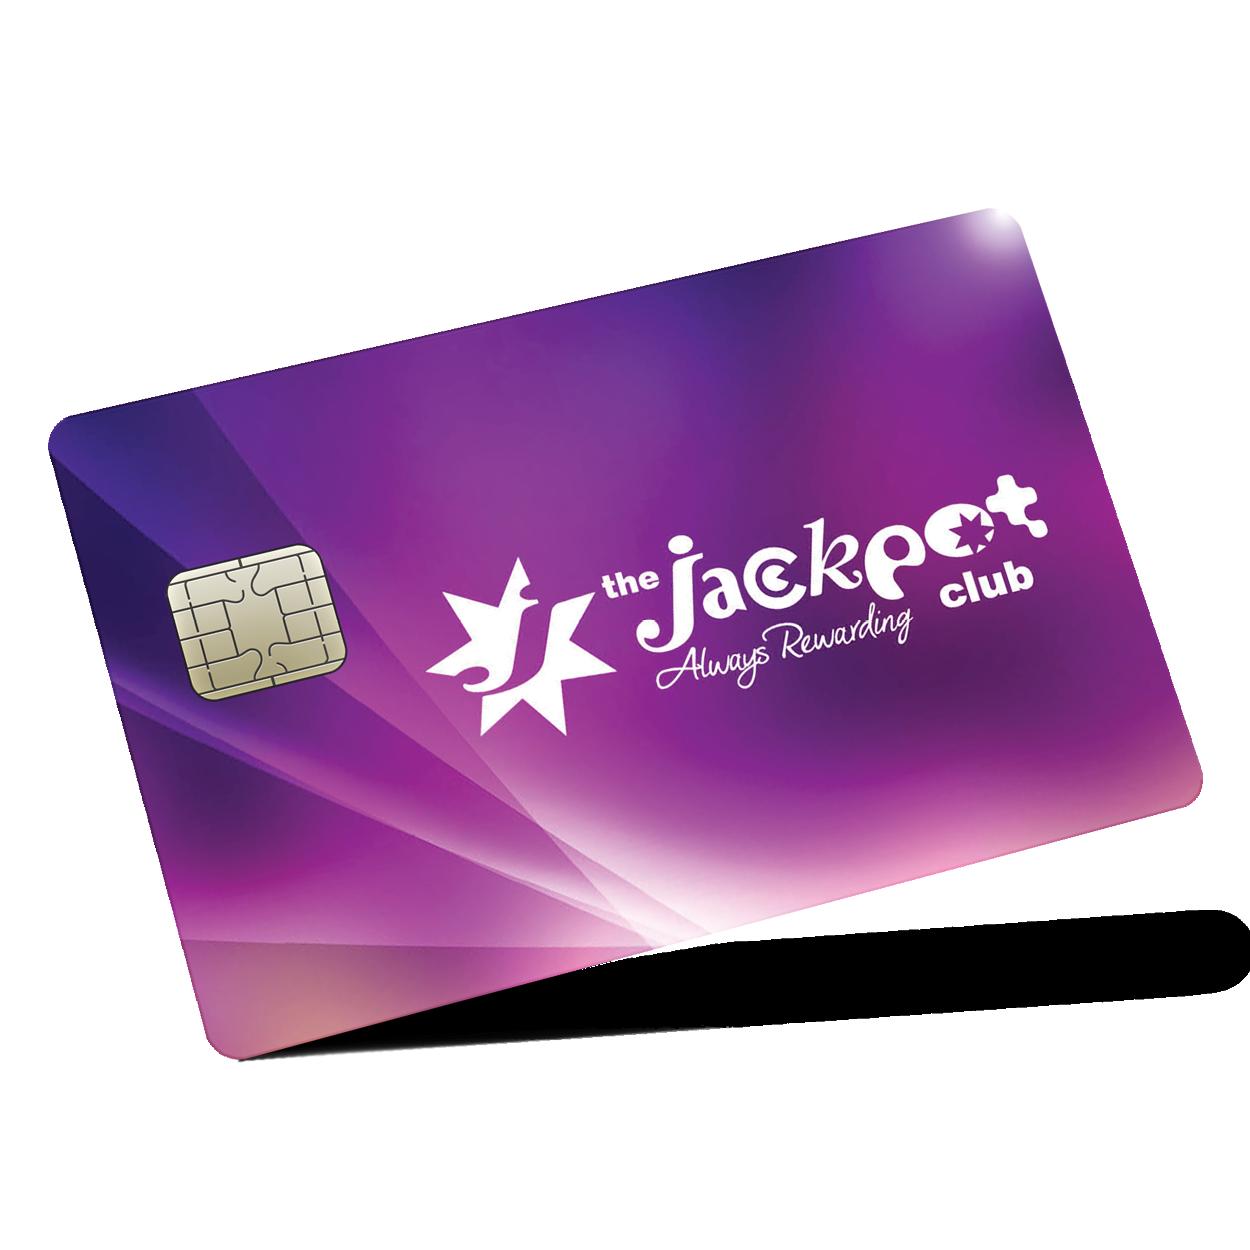 Jackpot Club_Membership Card 2018_Mock UP.png